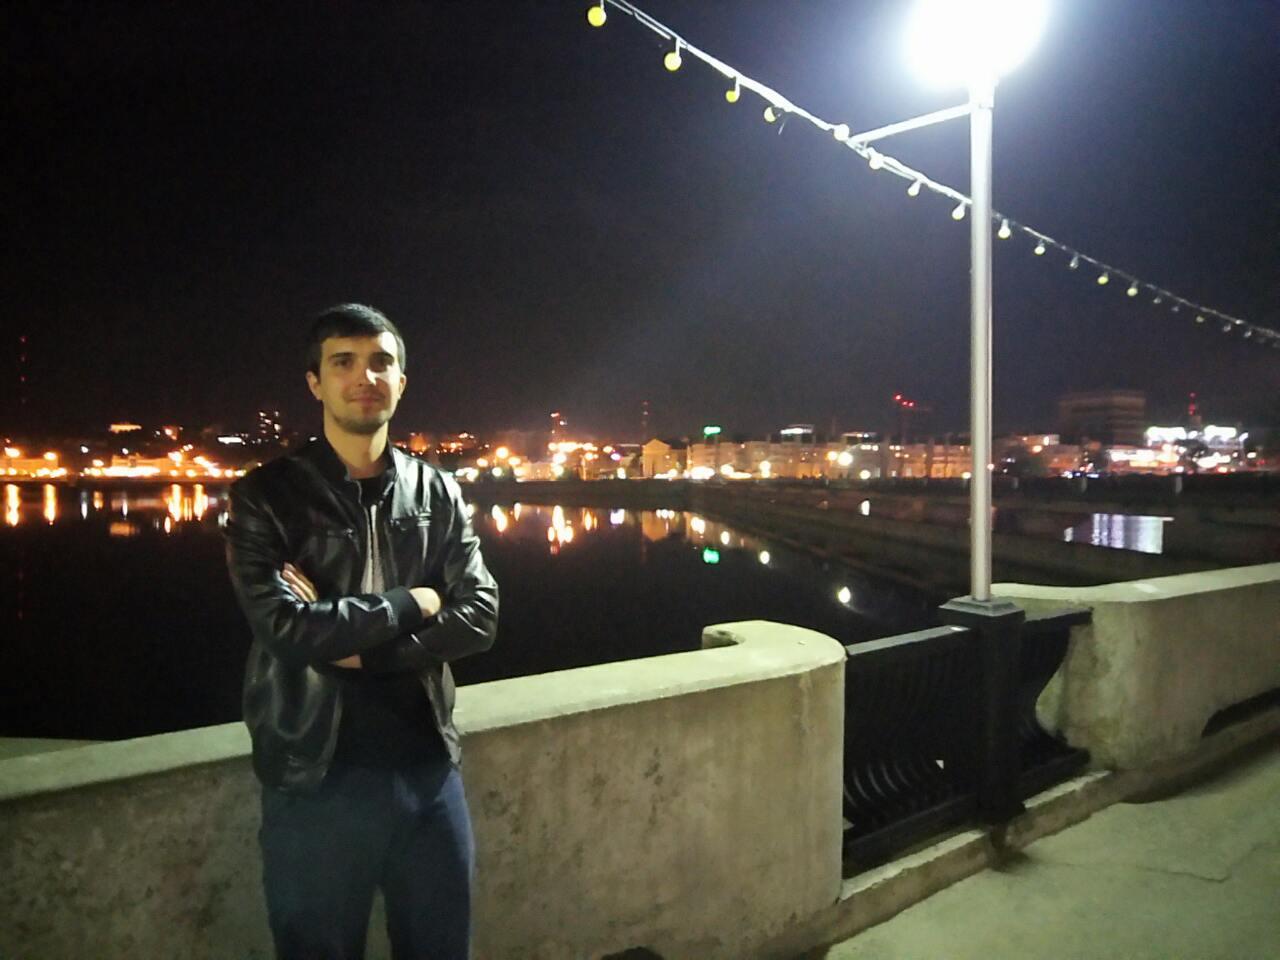 Андрей Васильев, Чебоксары - фото №3